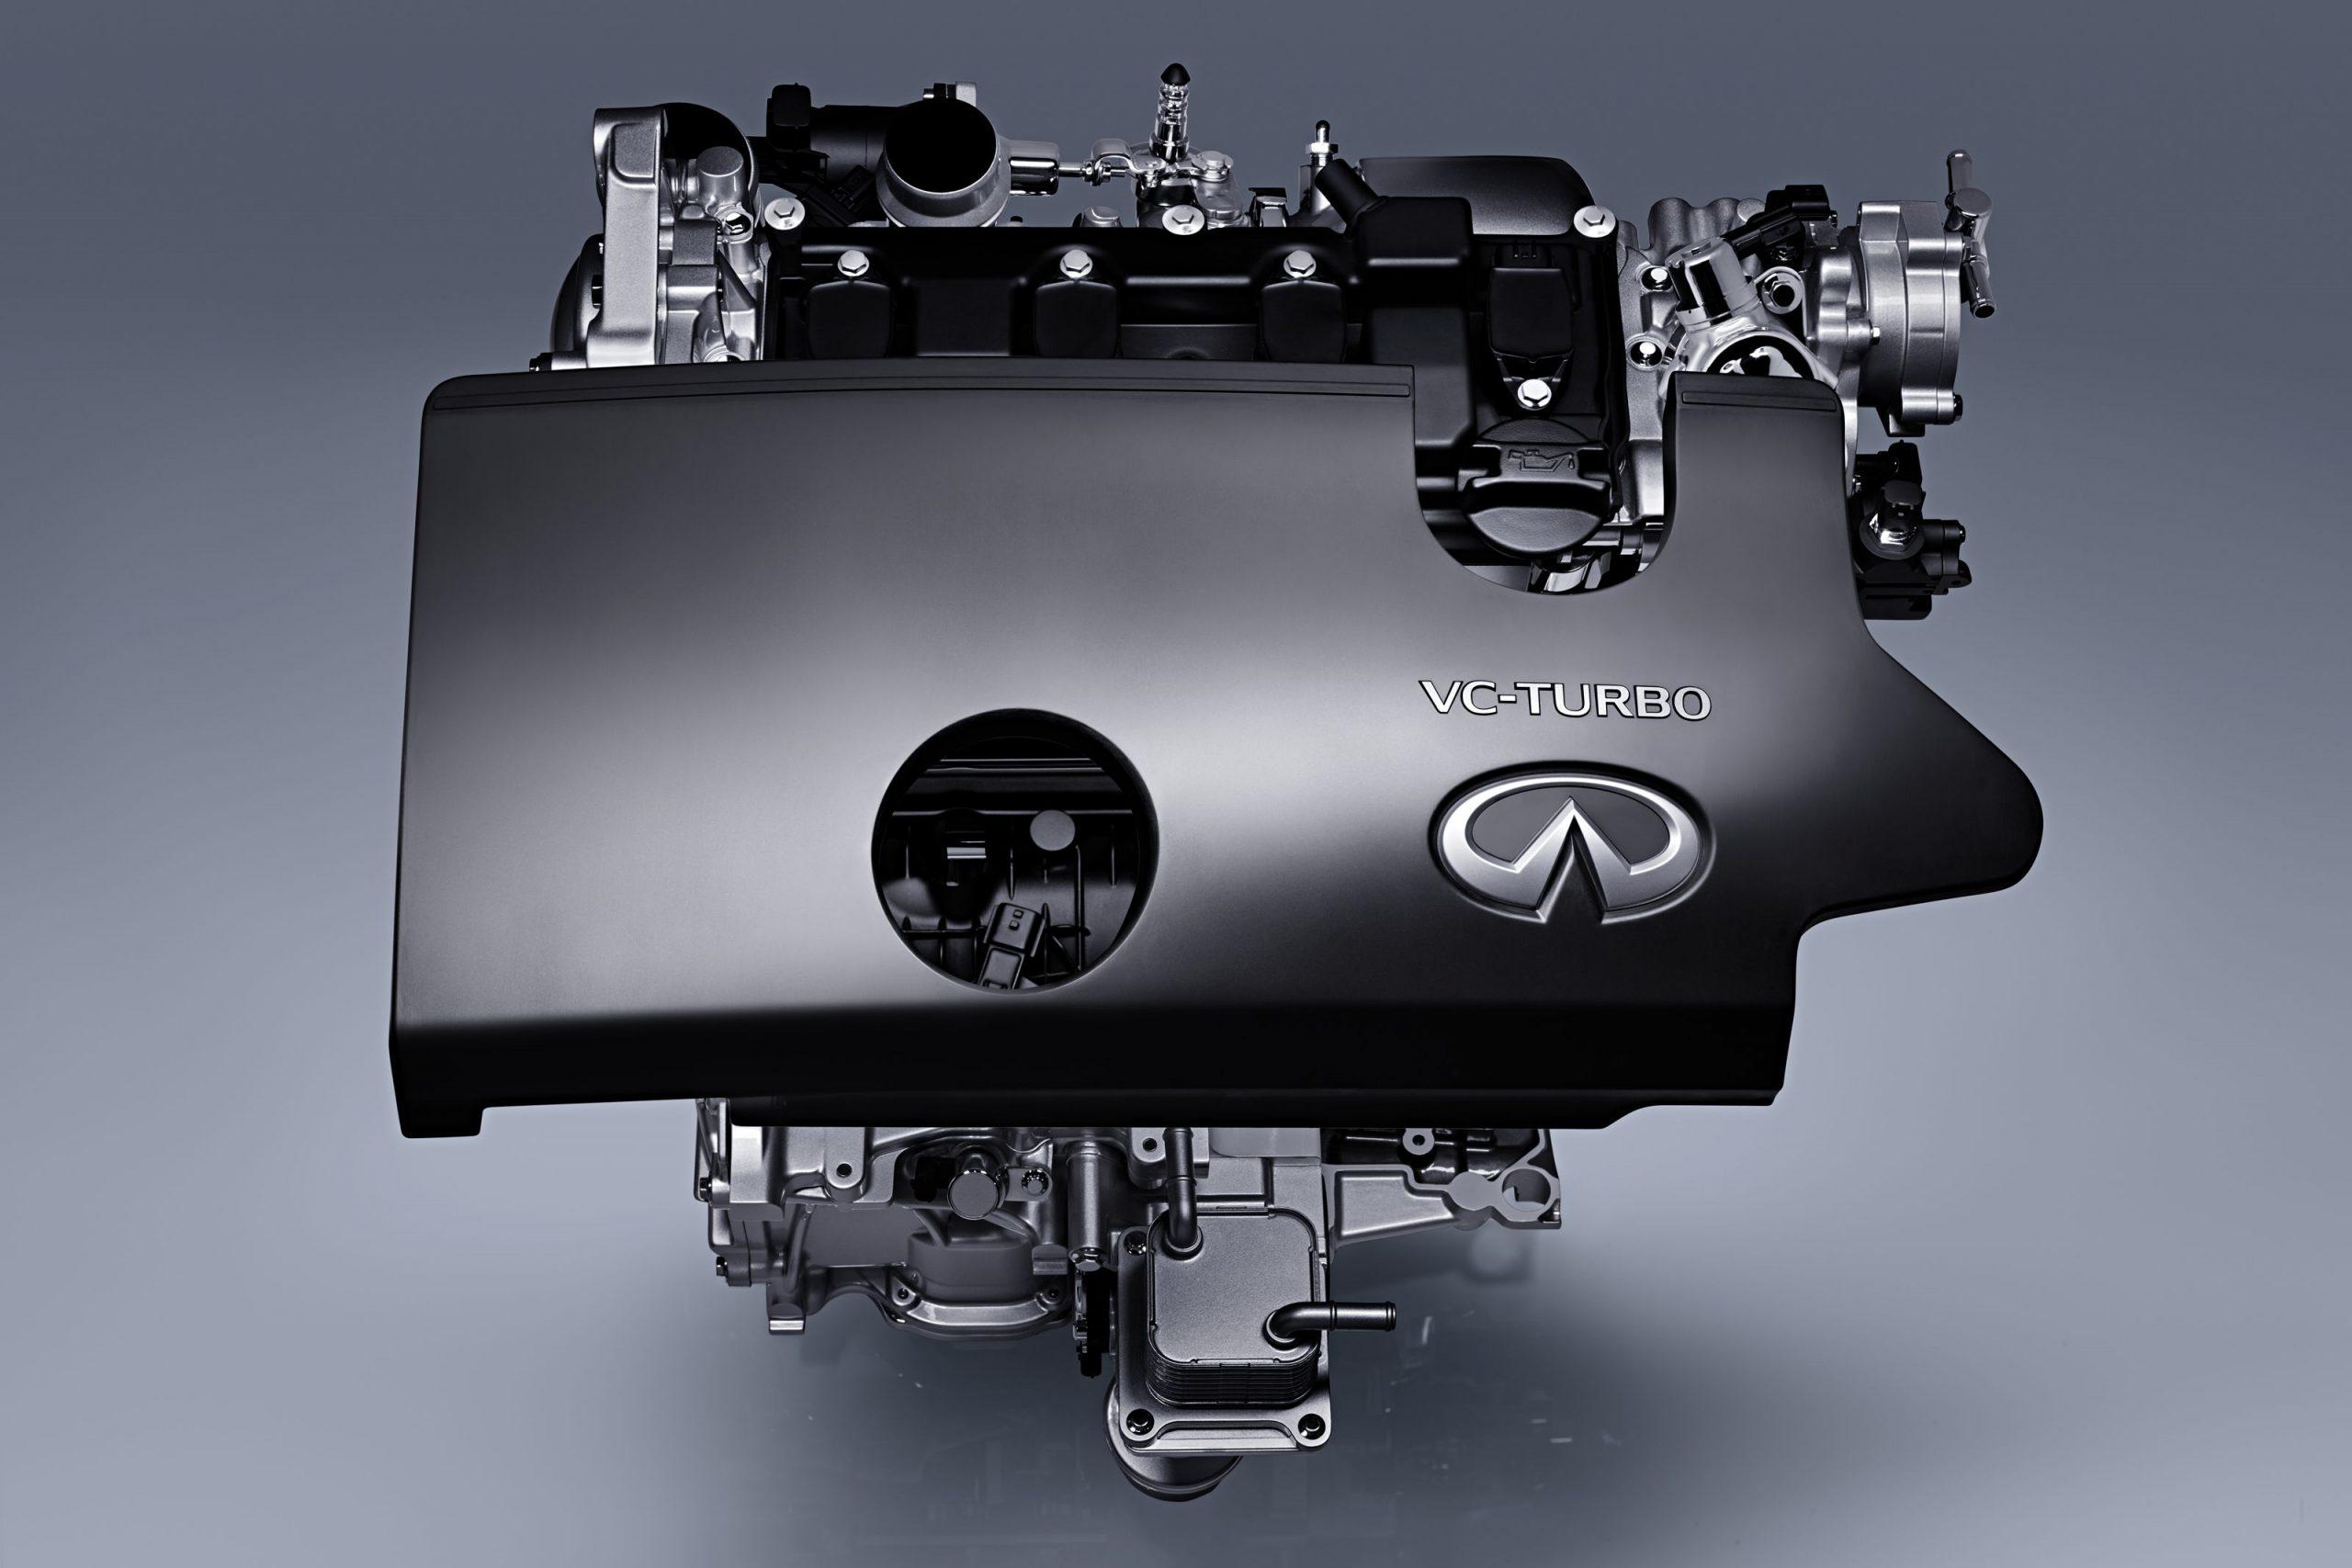 Двигатель Infiniti VC-Turbo